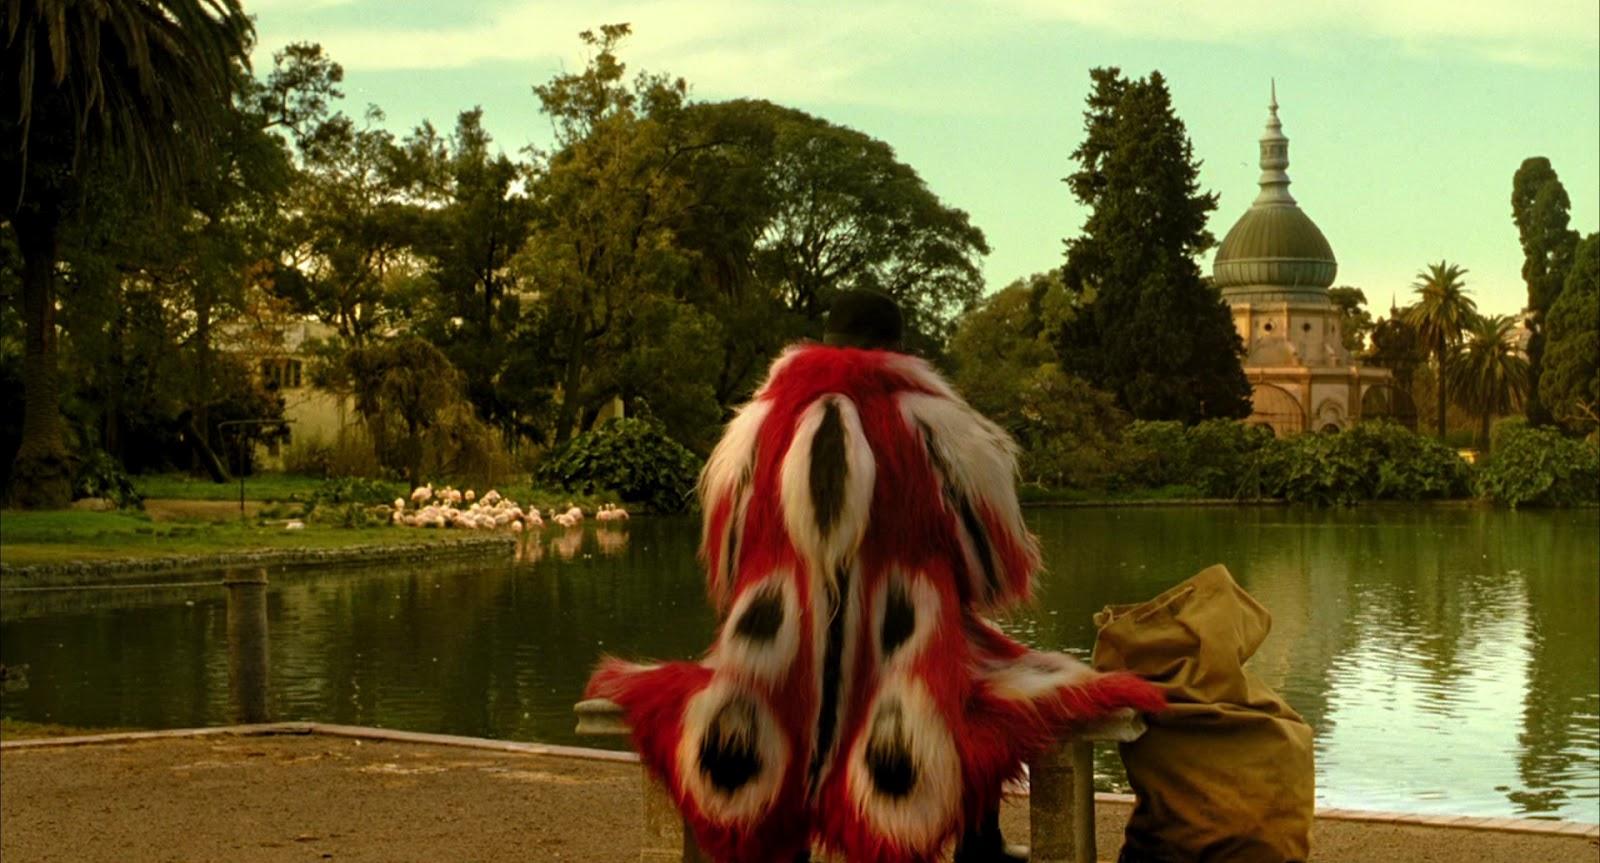 the fall by tarsem singh film